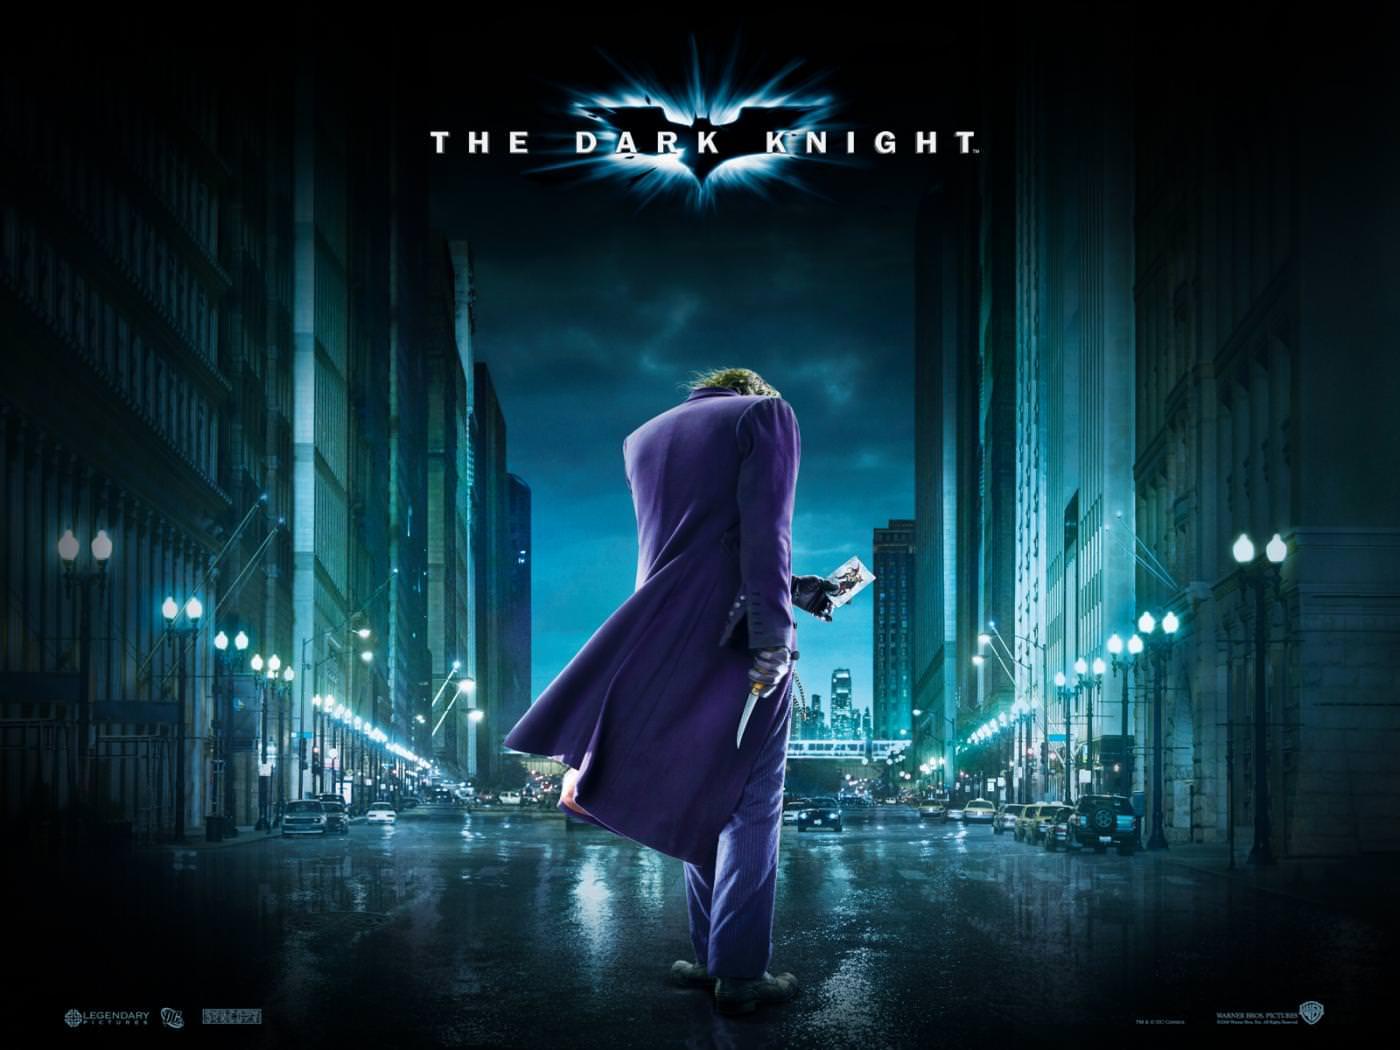 15 Best HD Superhero Movie WallpapersFreeCreatives 1400x1050